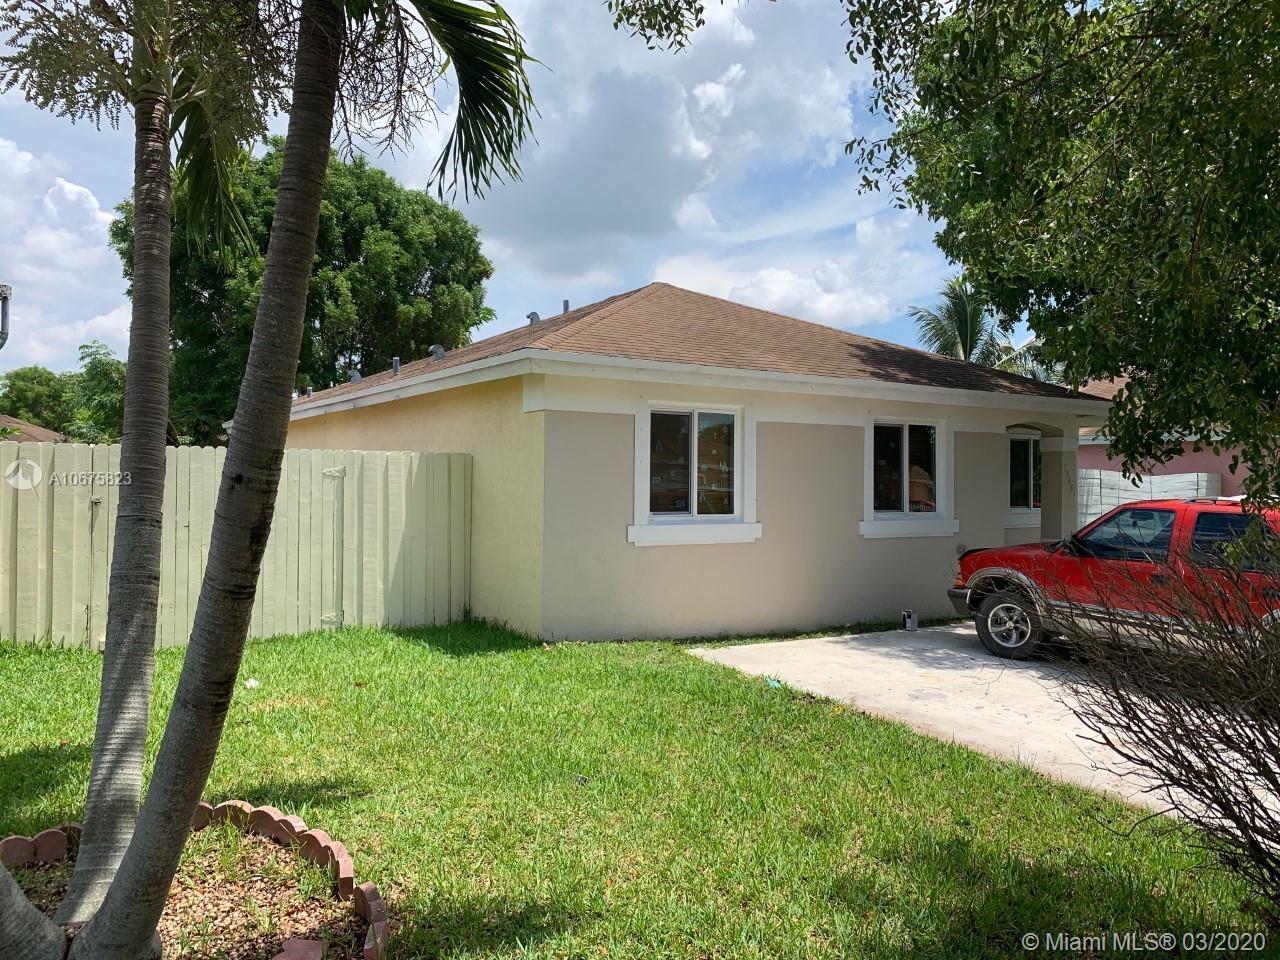 13481 SW 284th St, Homestead, FL 33033 - Homestead, FL real estate listing